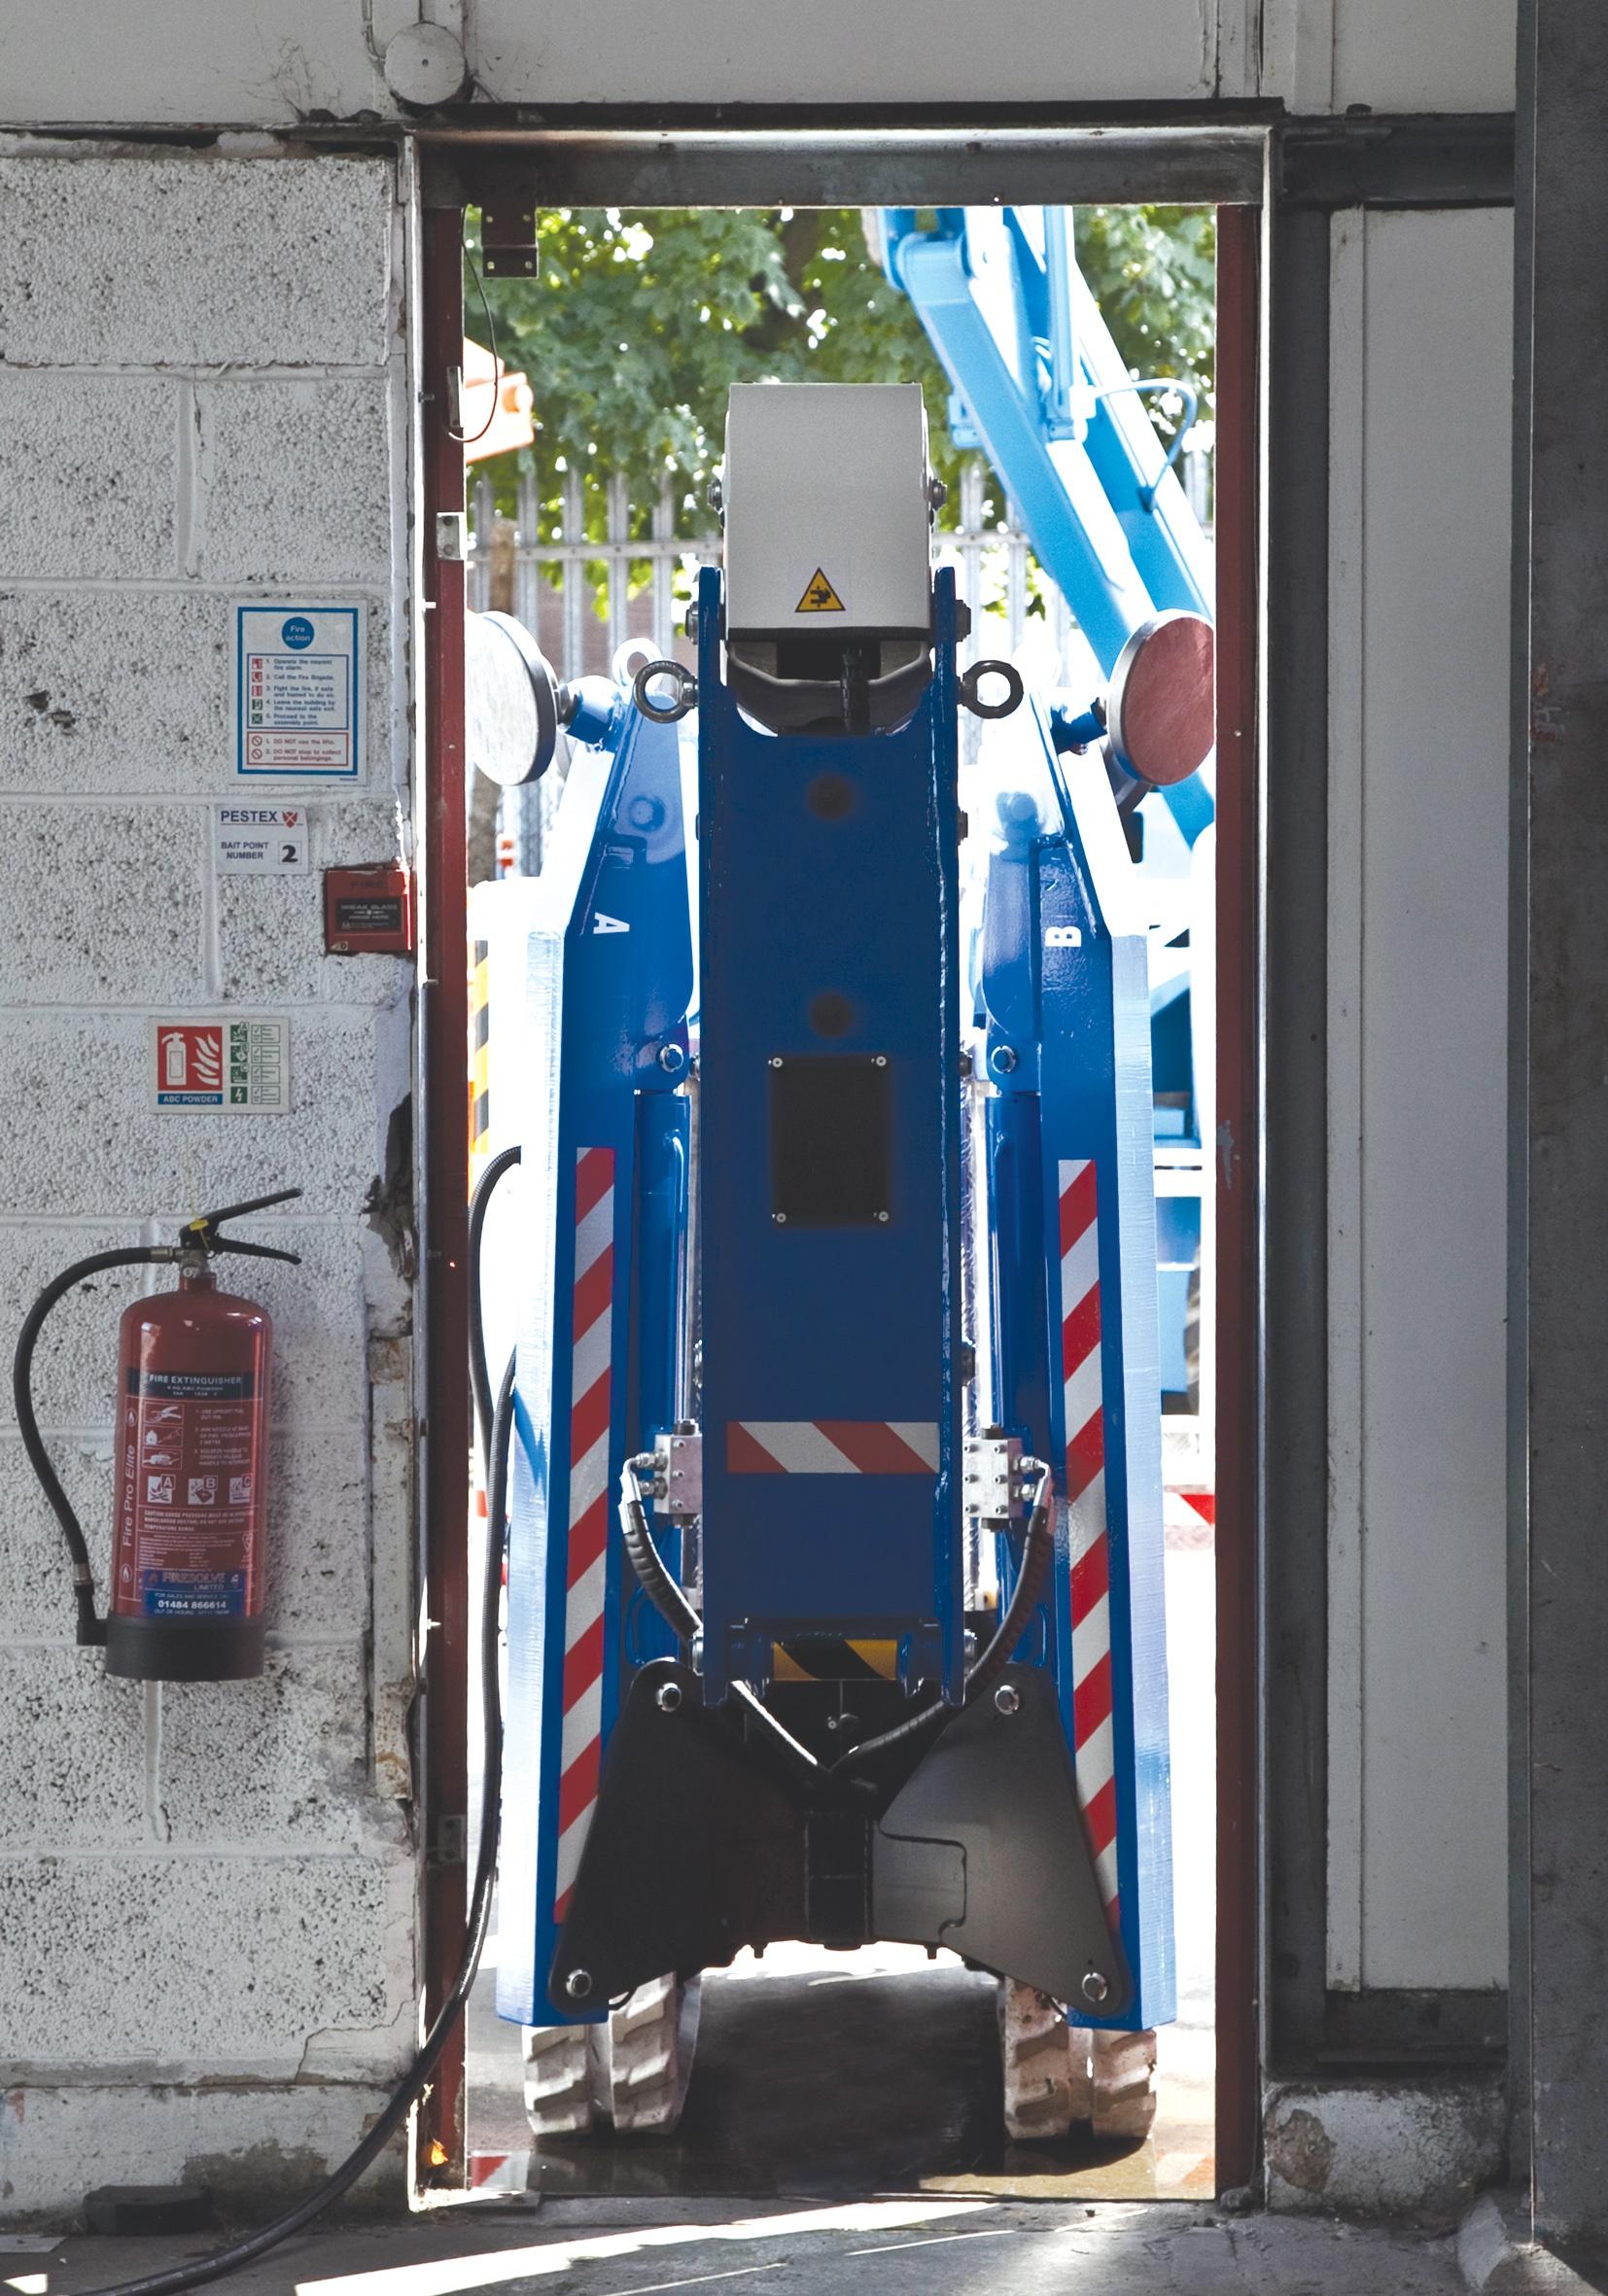 Bluelift spider lift travelling through narrow doorway